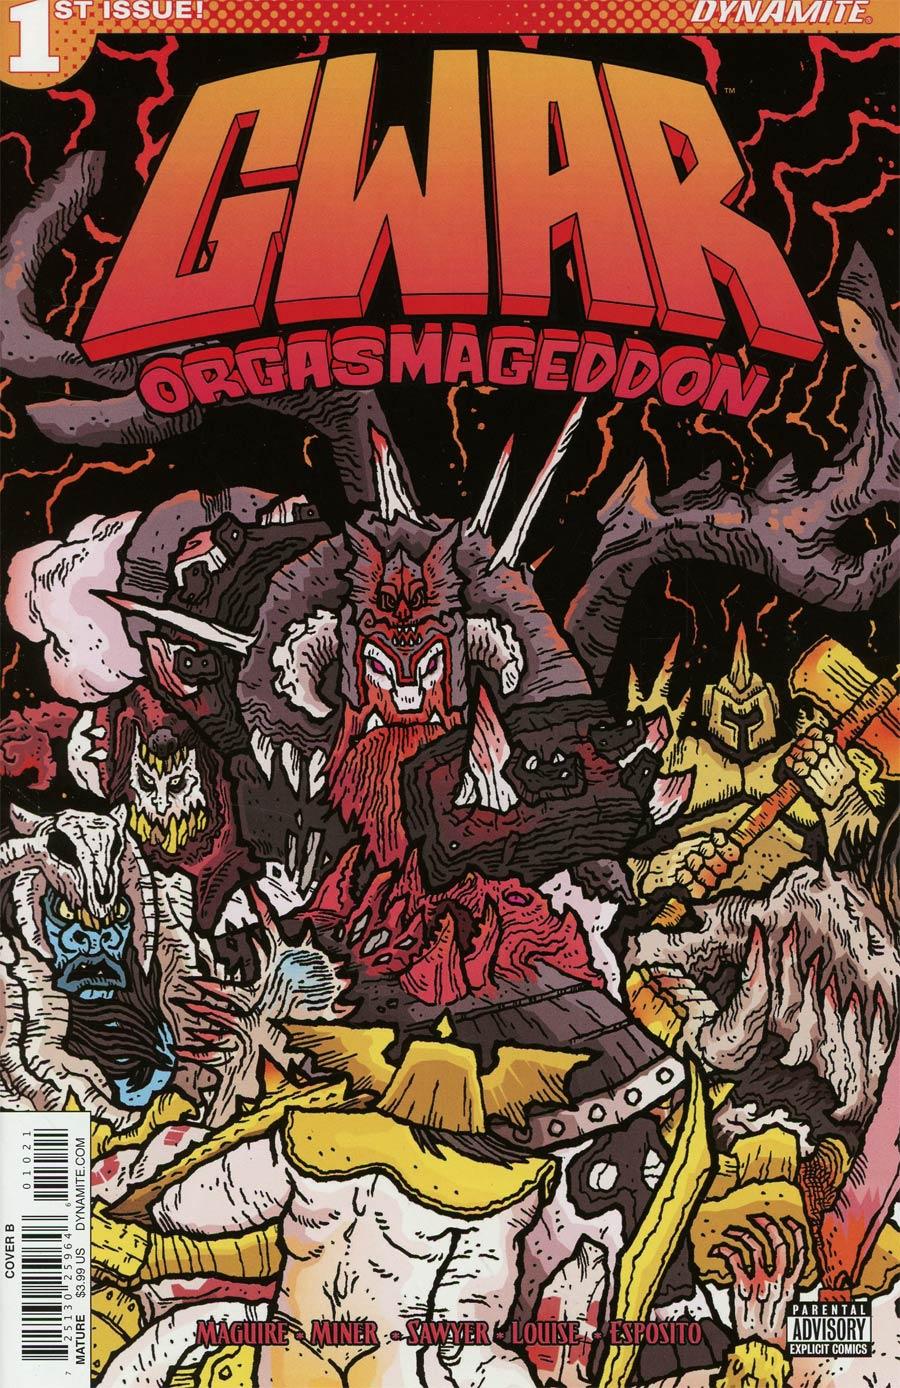 GWAR Orgasmageddon #1 Cover B Variant Scott Wygmans Cover